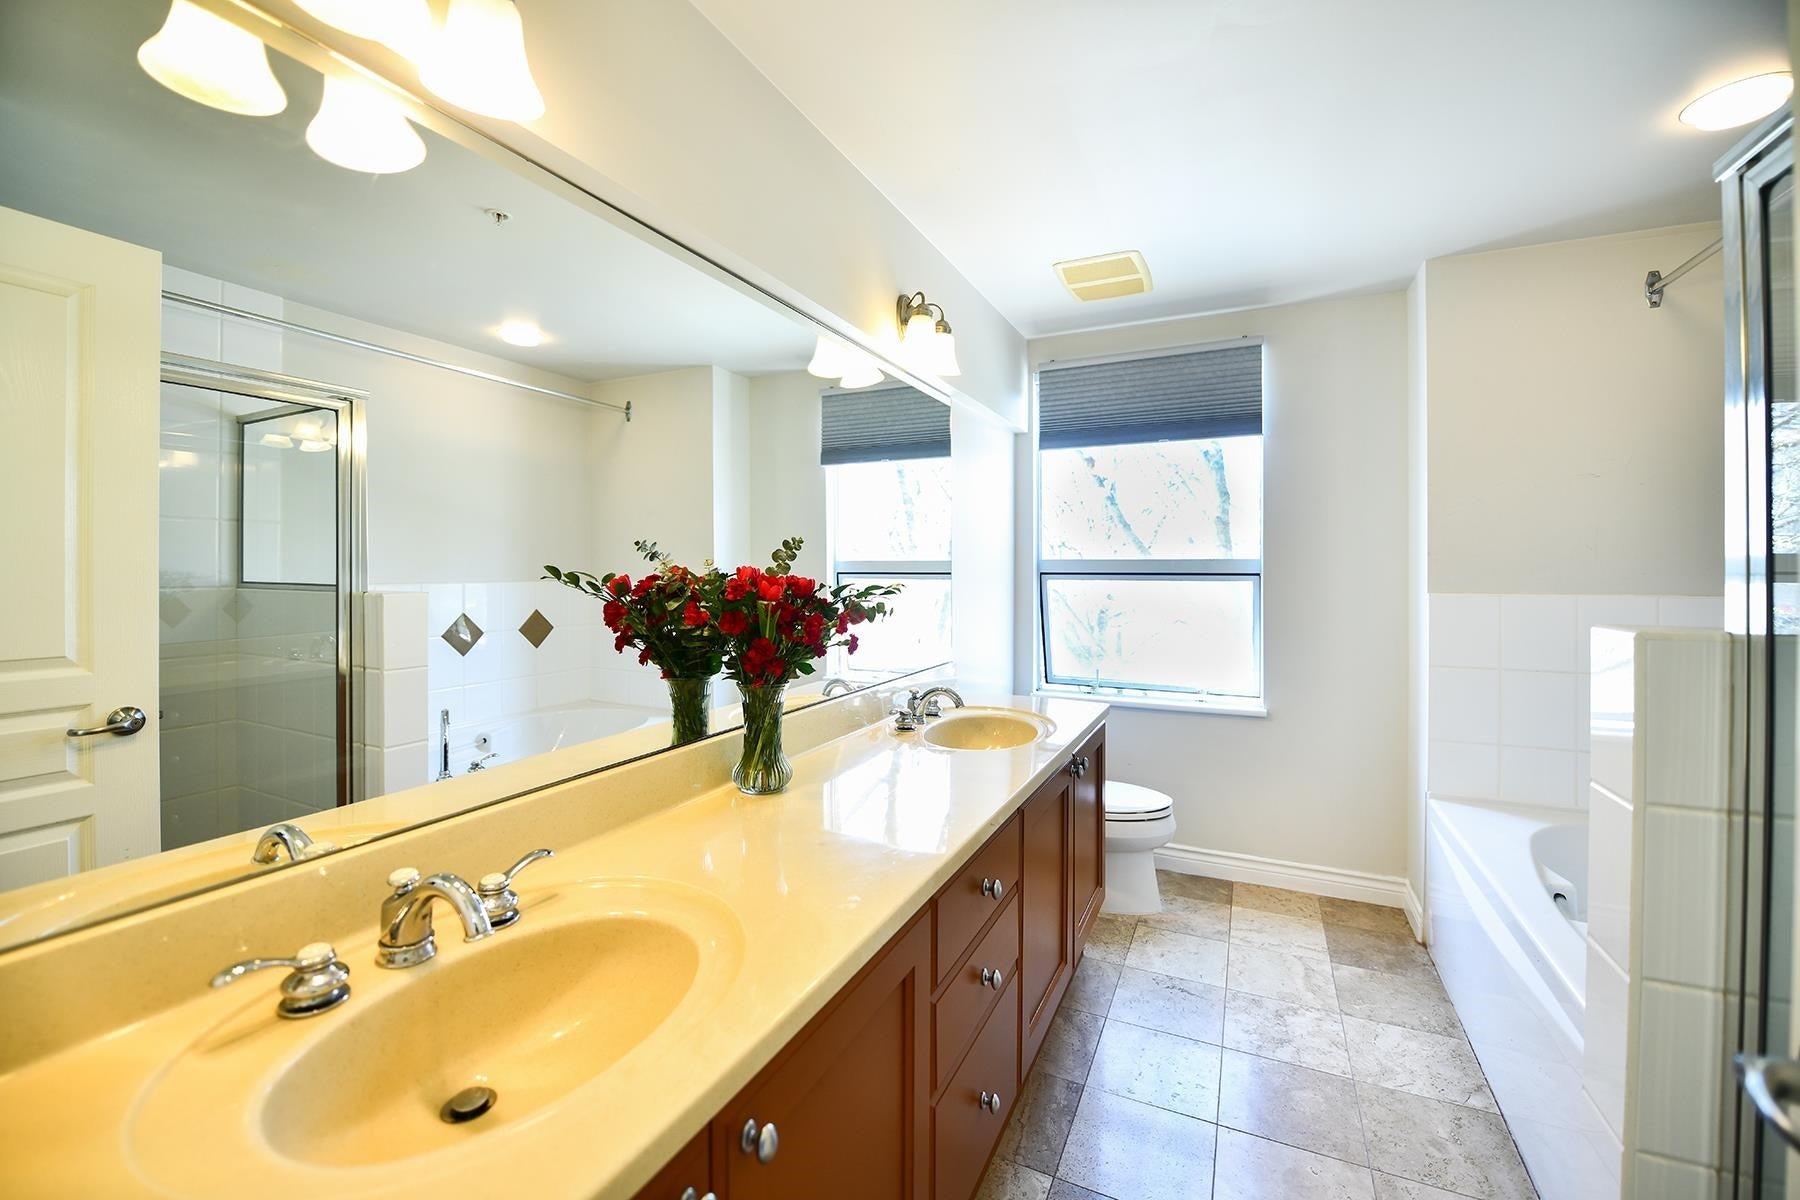 204 5790 EAST BOULEVARD - Kerrisdale Apartment/Condo for sale, 3 Bedrooms (R2604138) - #15